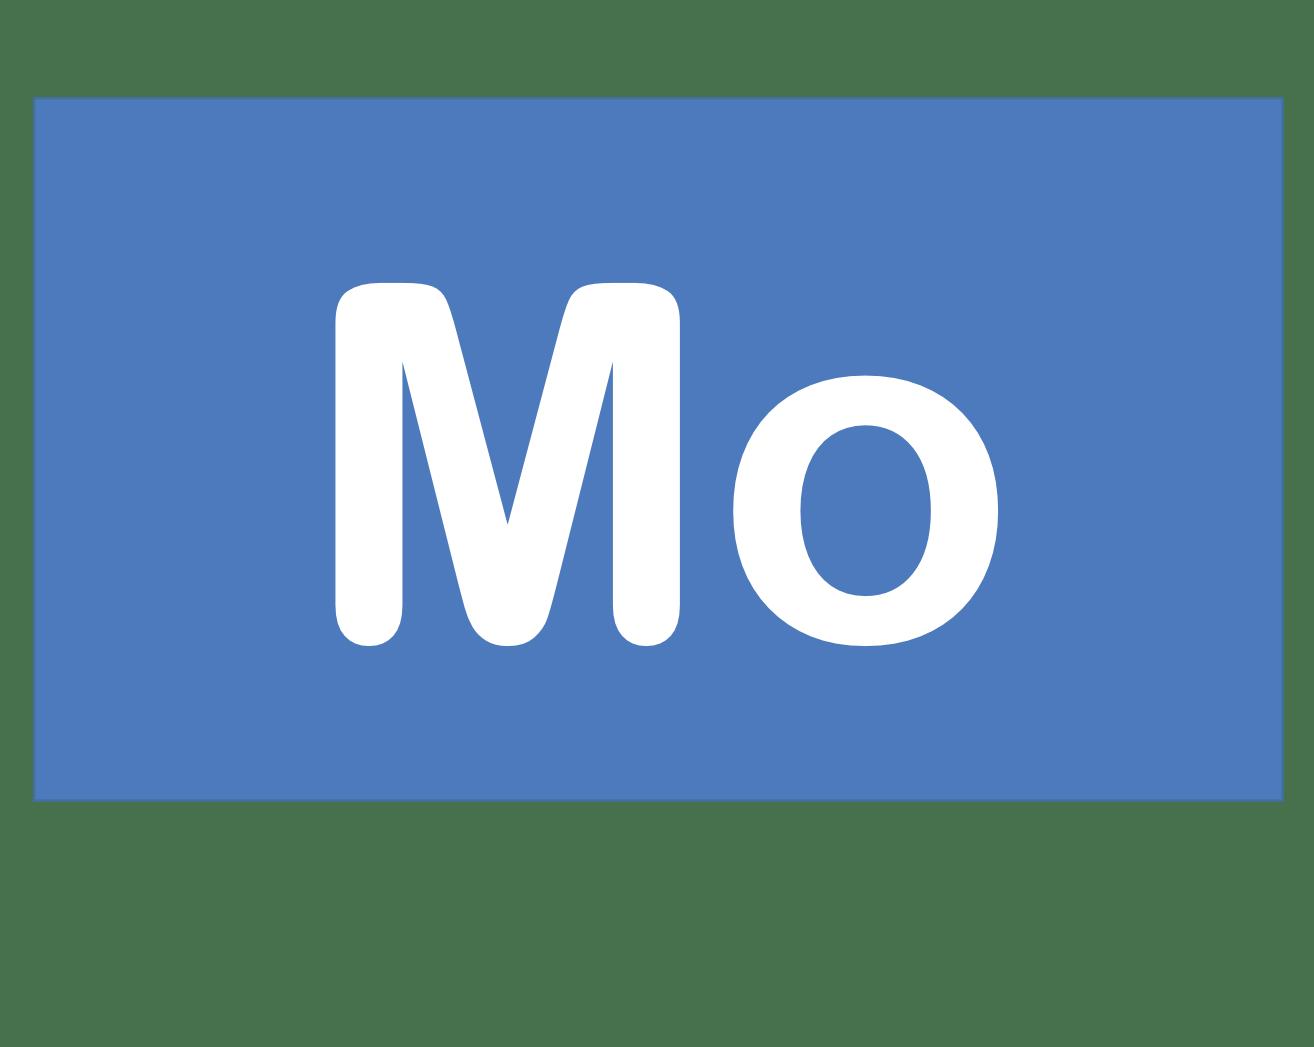 42 Mo モリブデン Molybdenum 元素 記号 周期表 化学 原子